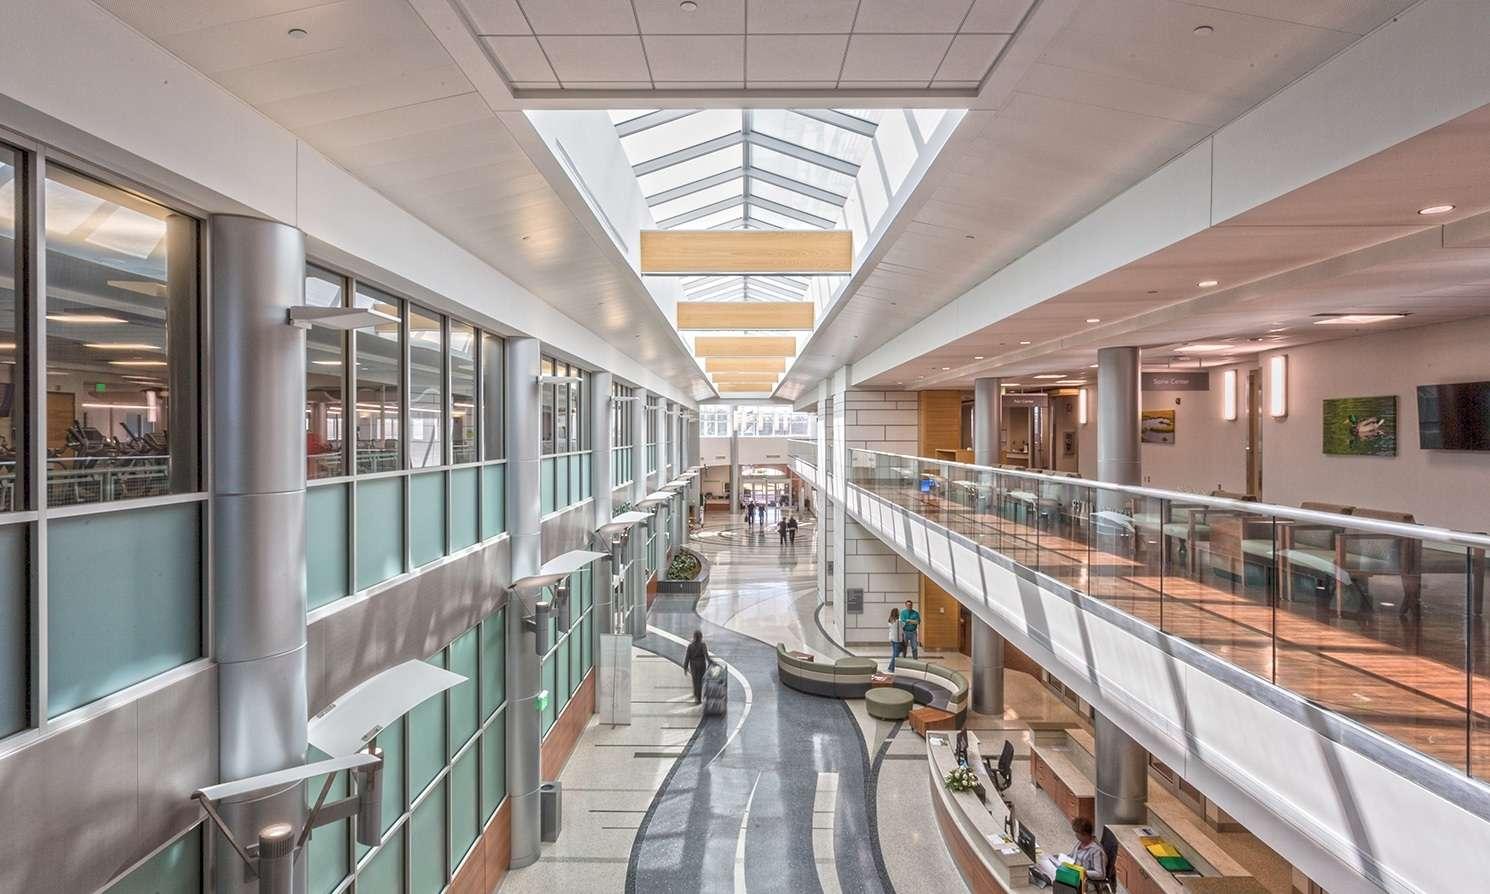 Thibodaux Wellness Mall